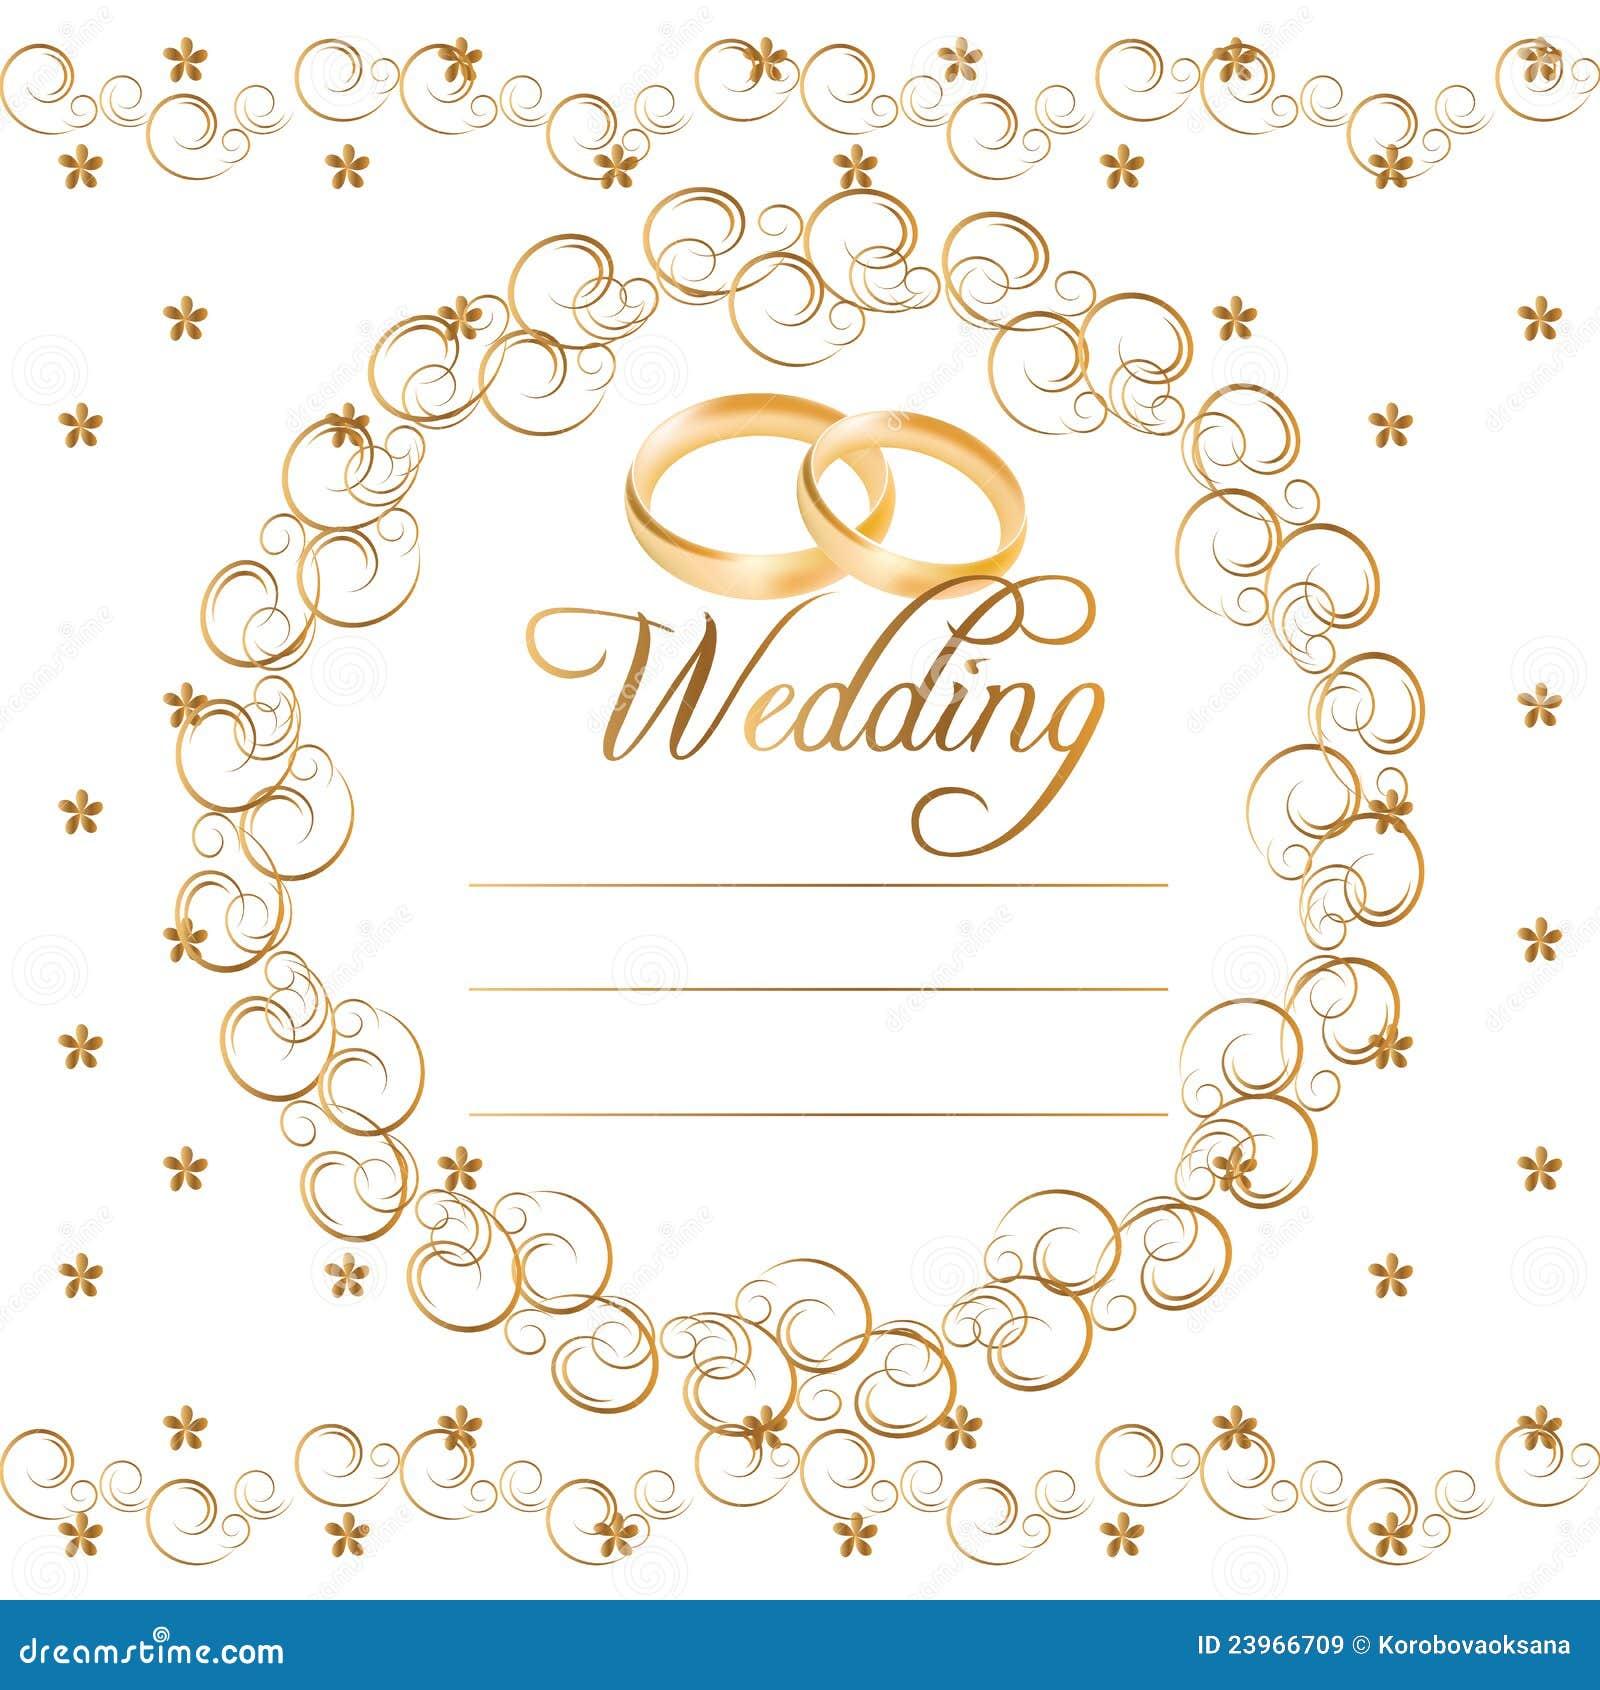 Vector Wedding Cards